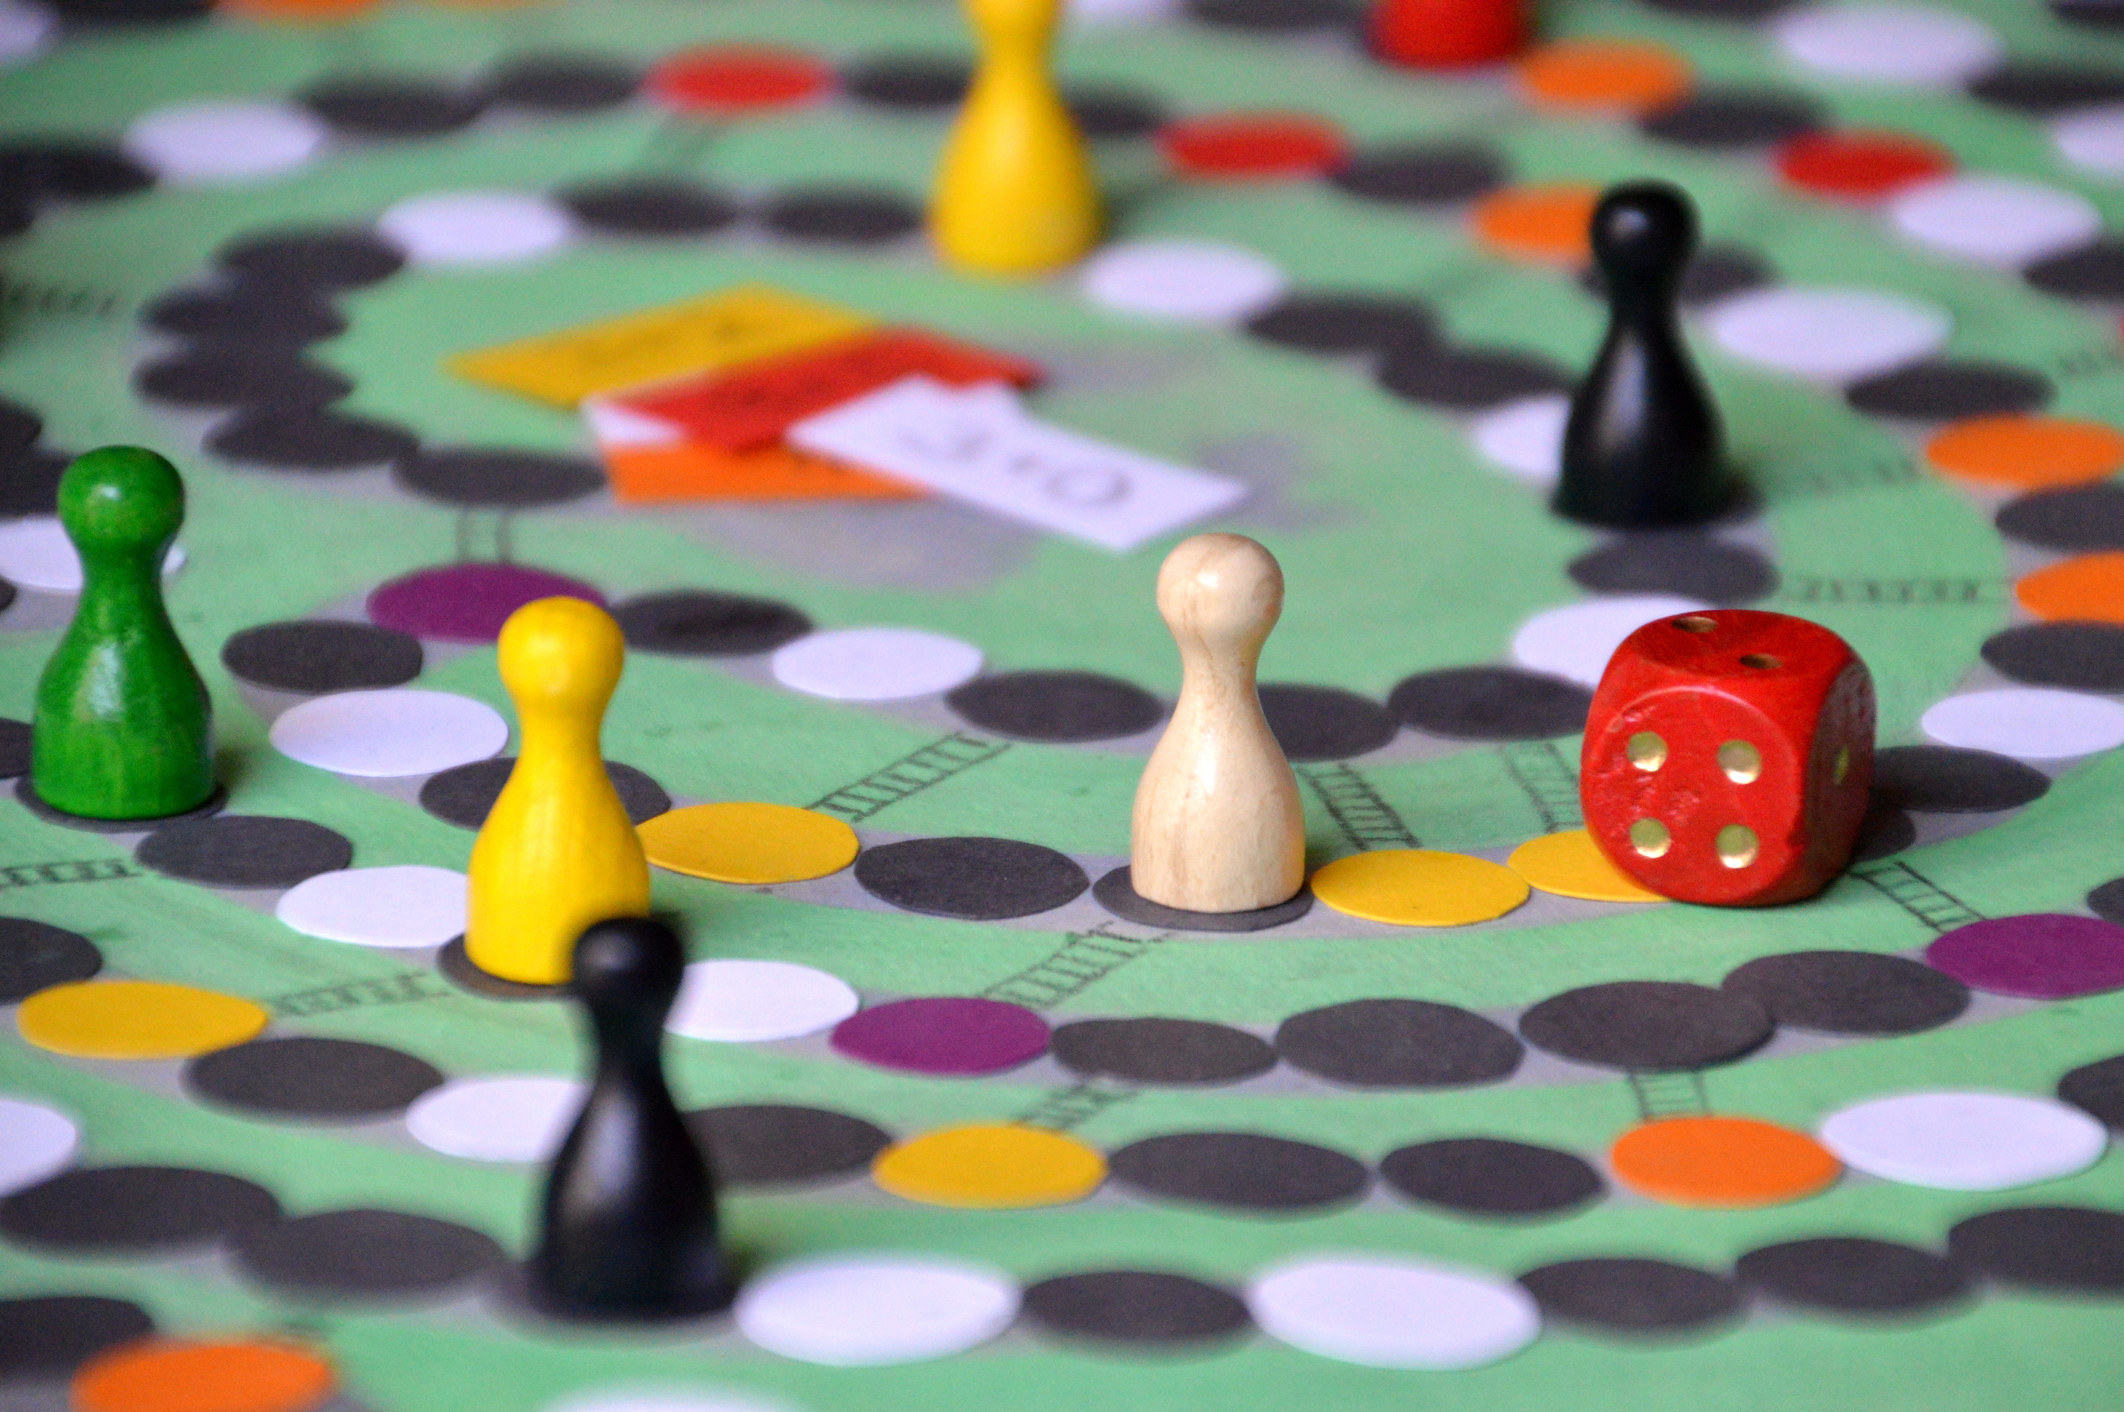 A board game.